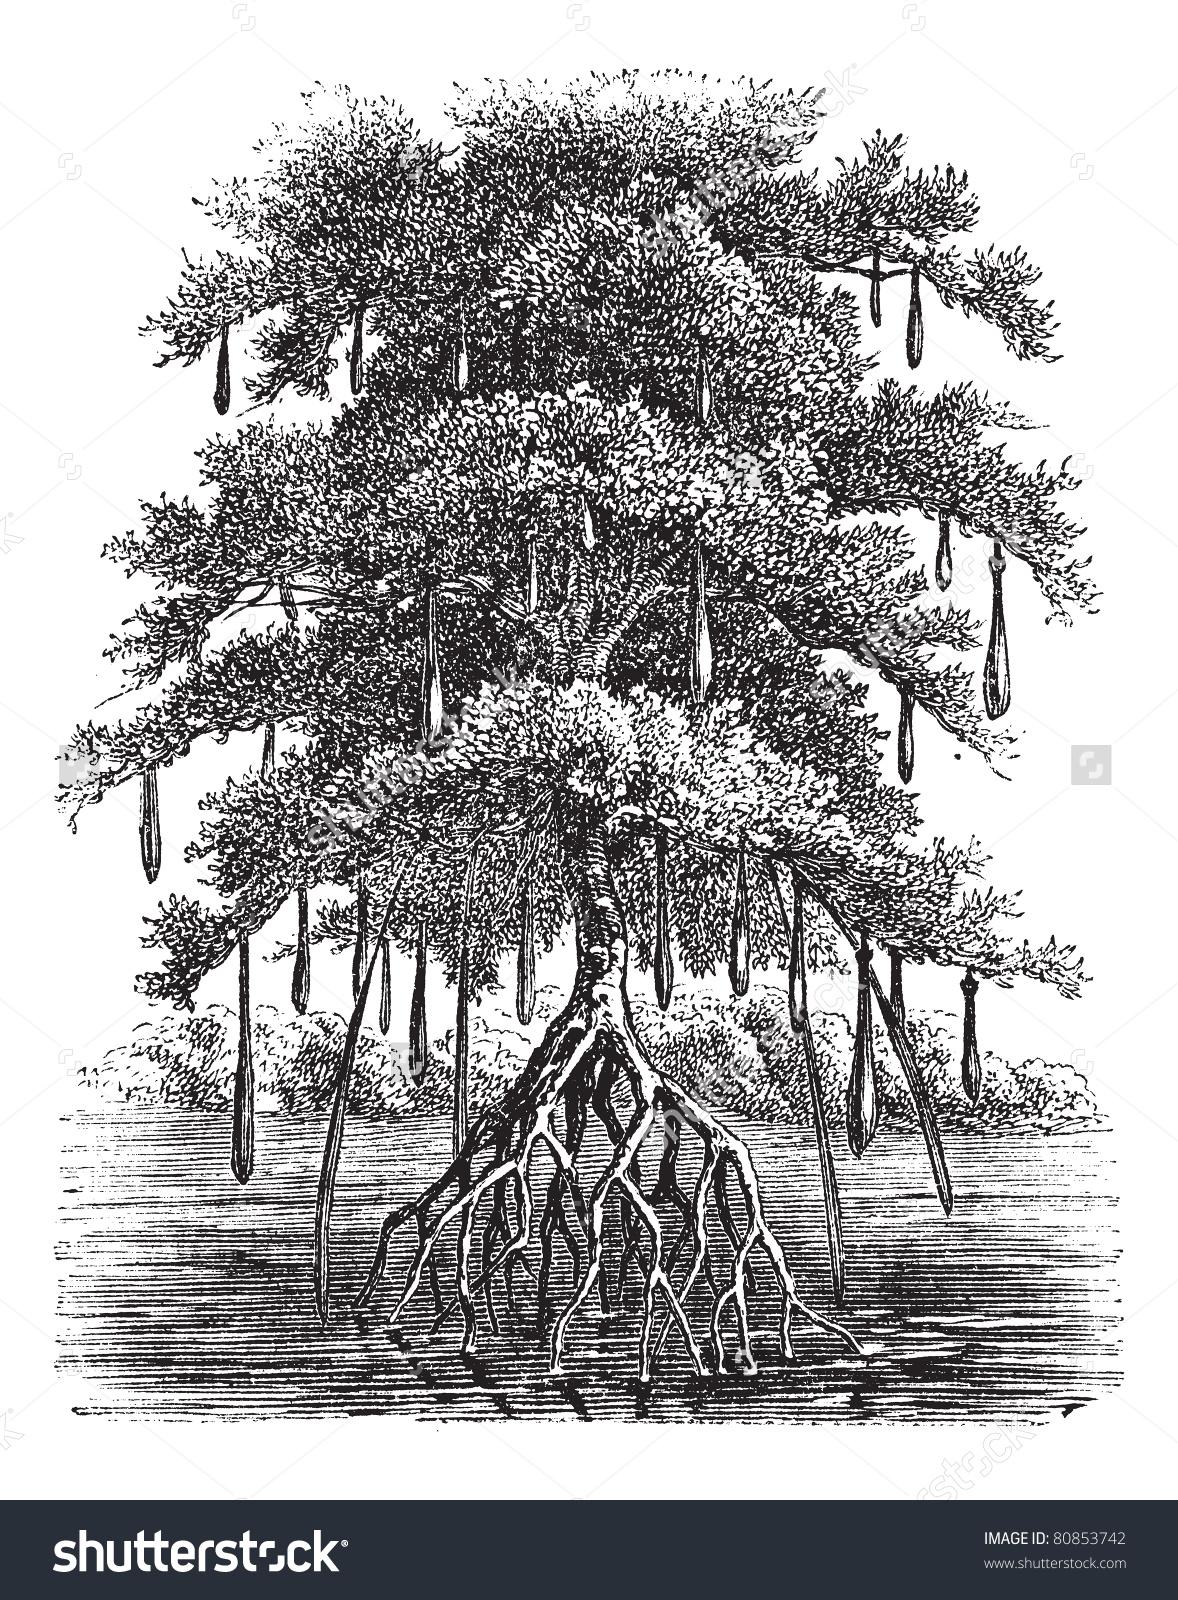 Mangrove Mangal Mangrove Swamp Mangrove Forest Stock Vector.